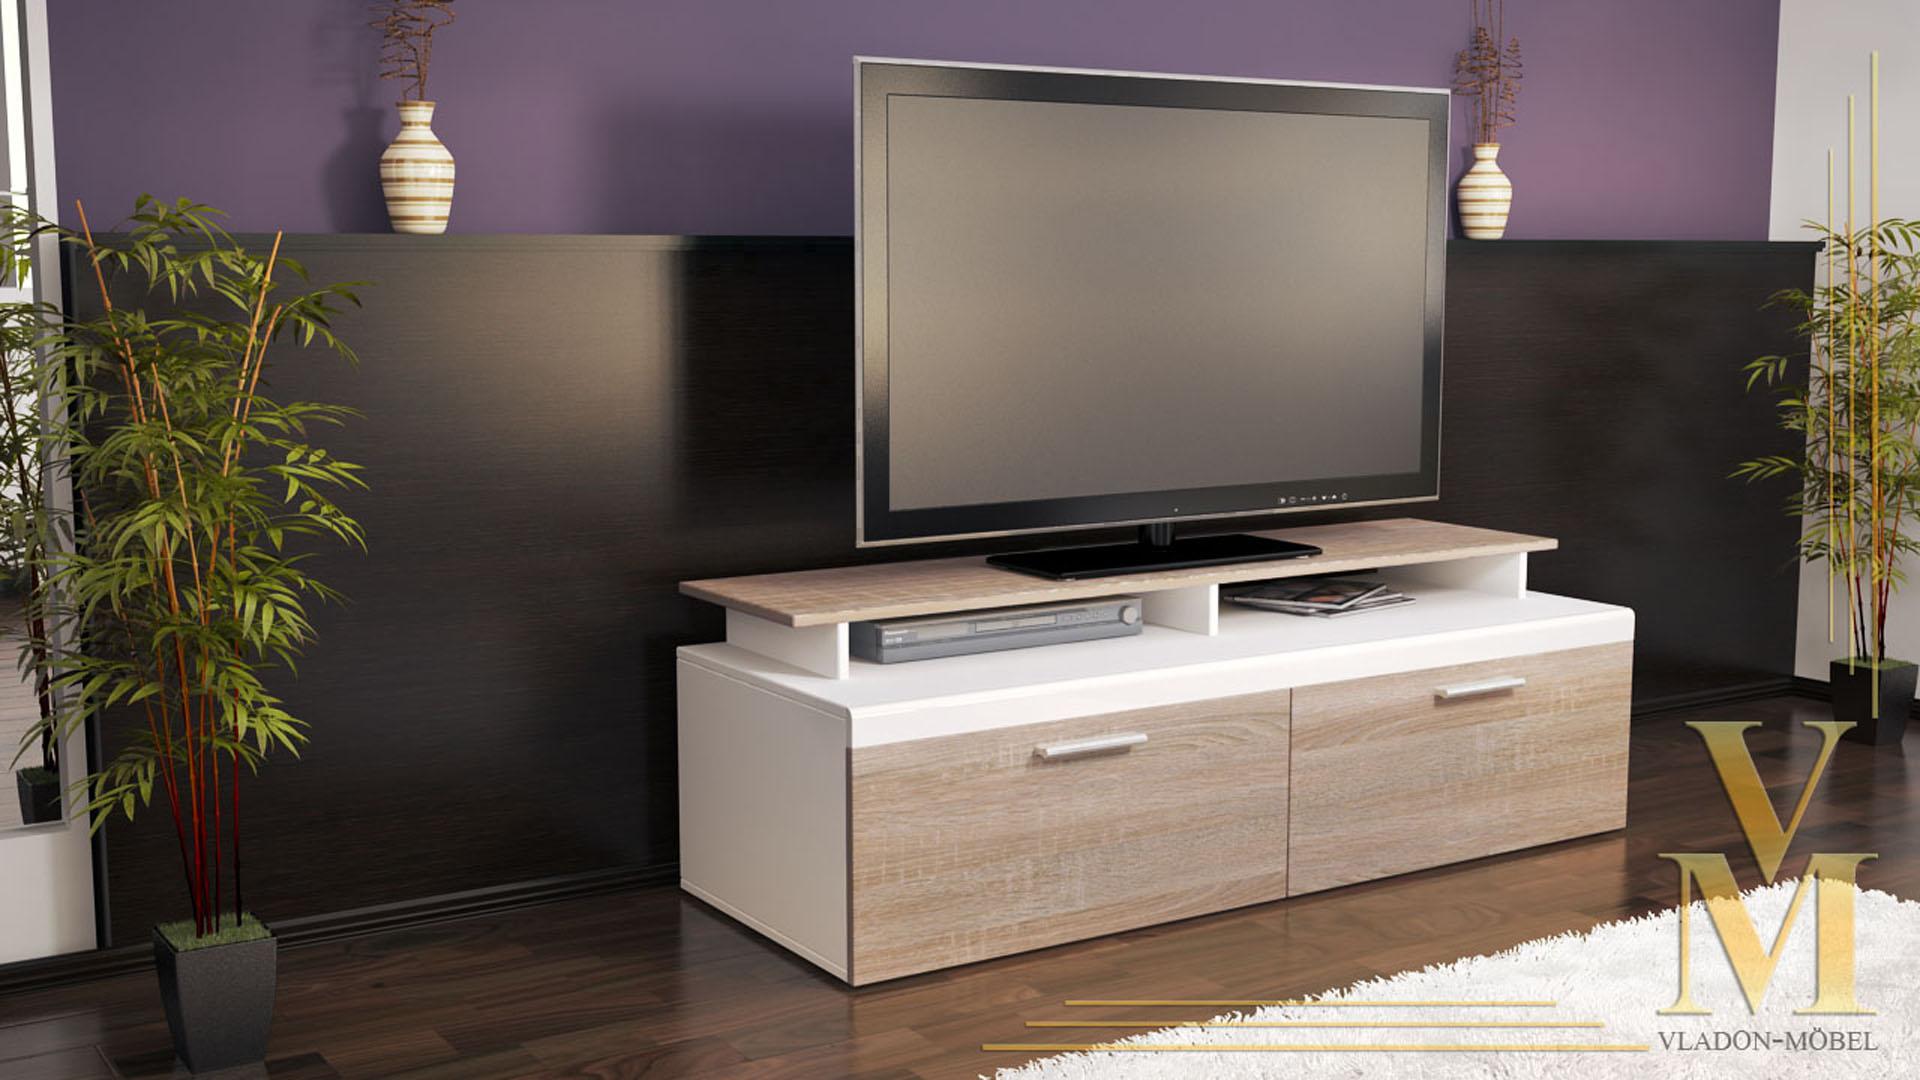 tv stand unit board lowboard cabinet atlanta white high gloss natural tones ebay. Black Bedroom Furniture Sets. Home Design Ideas